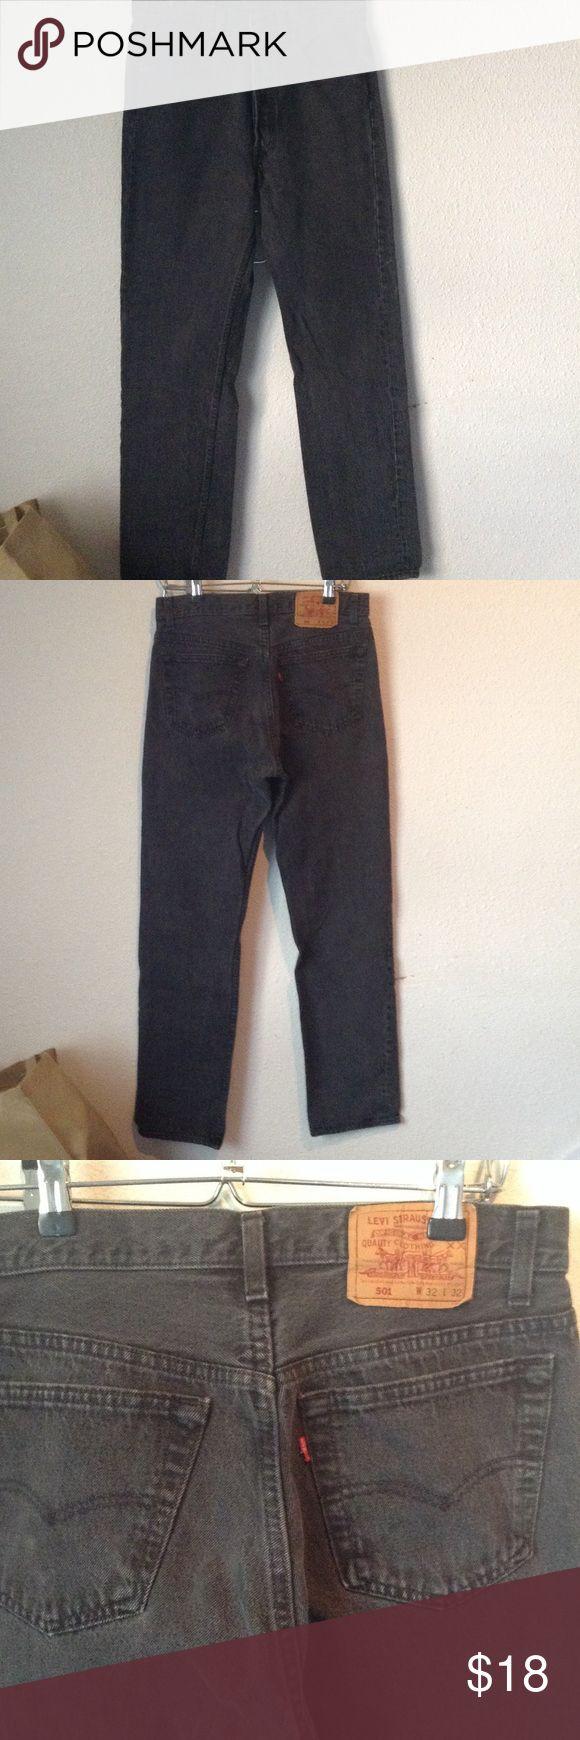 Men's Levis 501 black 32x32 Men's Levis black 501 like new only worn few times Jeans